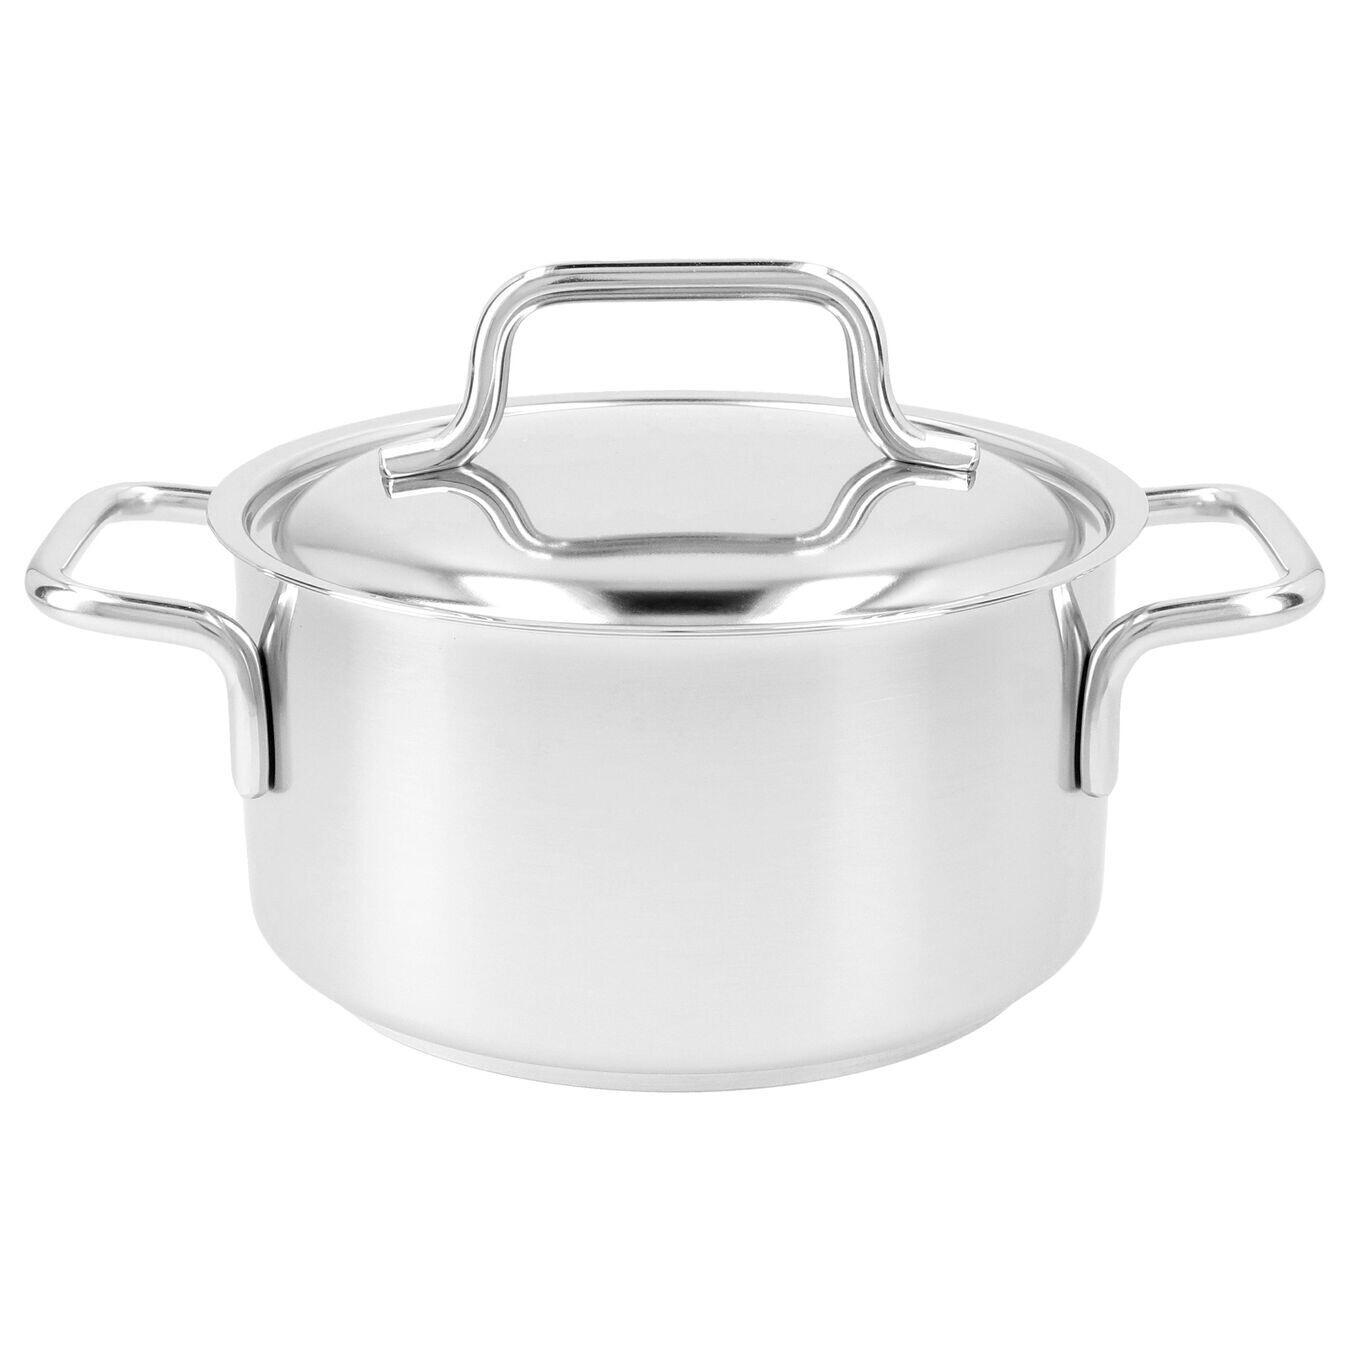 DEMEYERE 'apollo 7' kookpot met deksel 16 cm / 1,5 L  PROMO 115,00 -20%